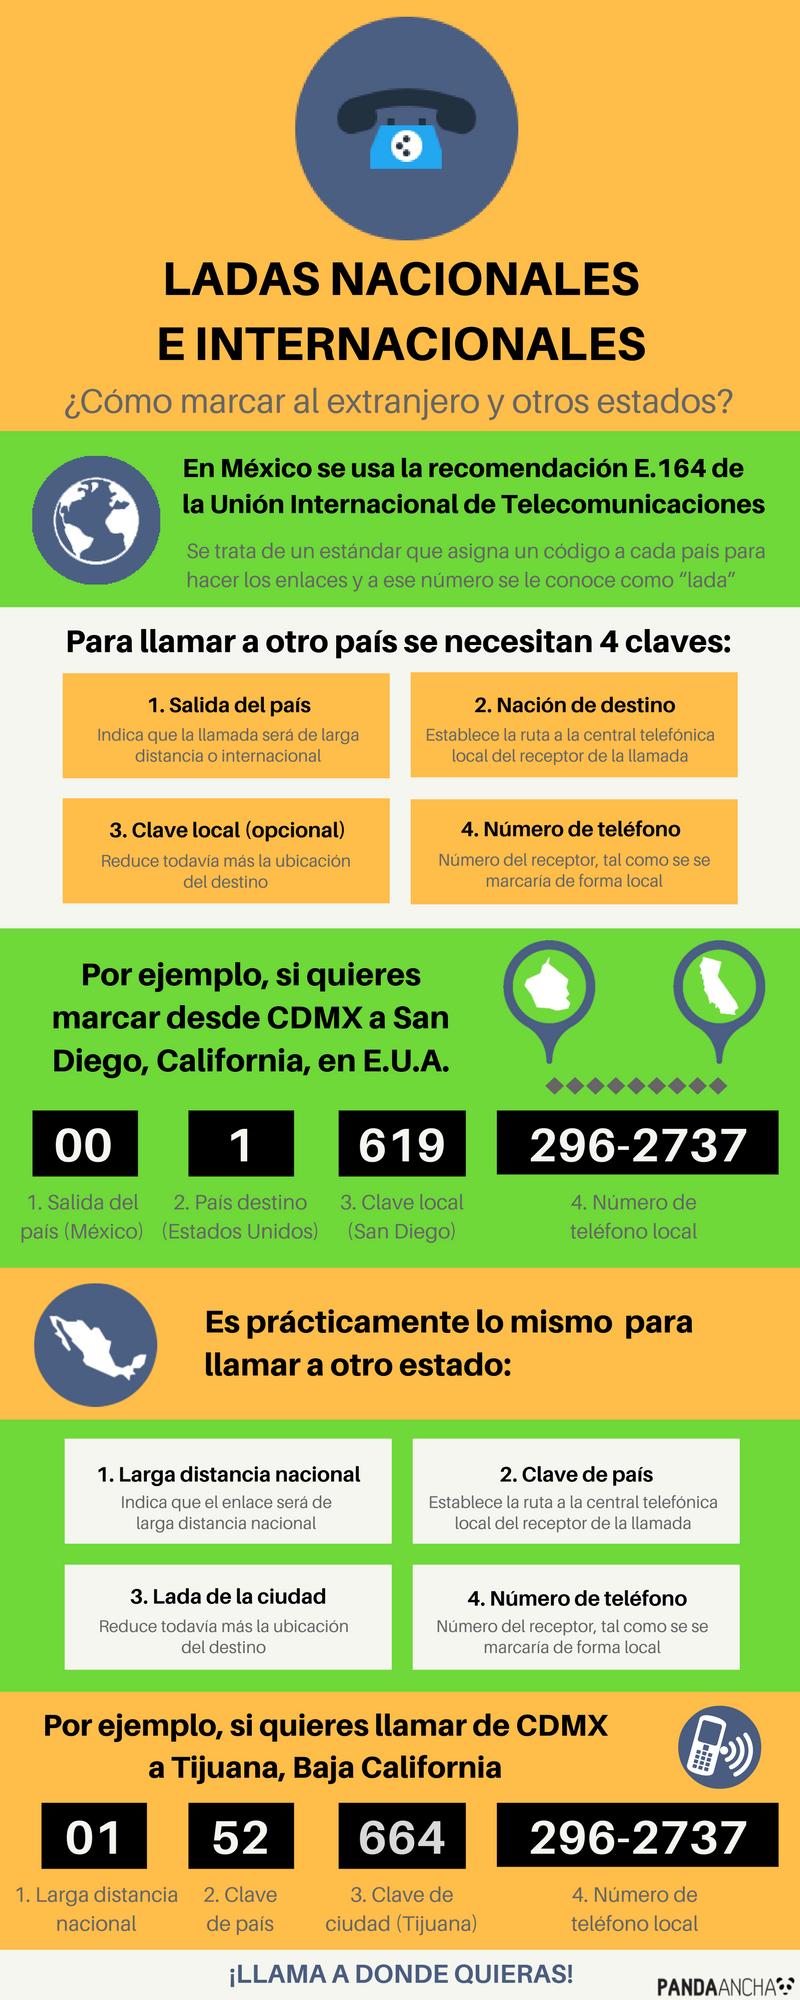 cómo marcar ladas en México inforgrafía